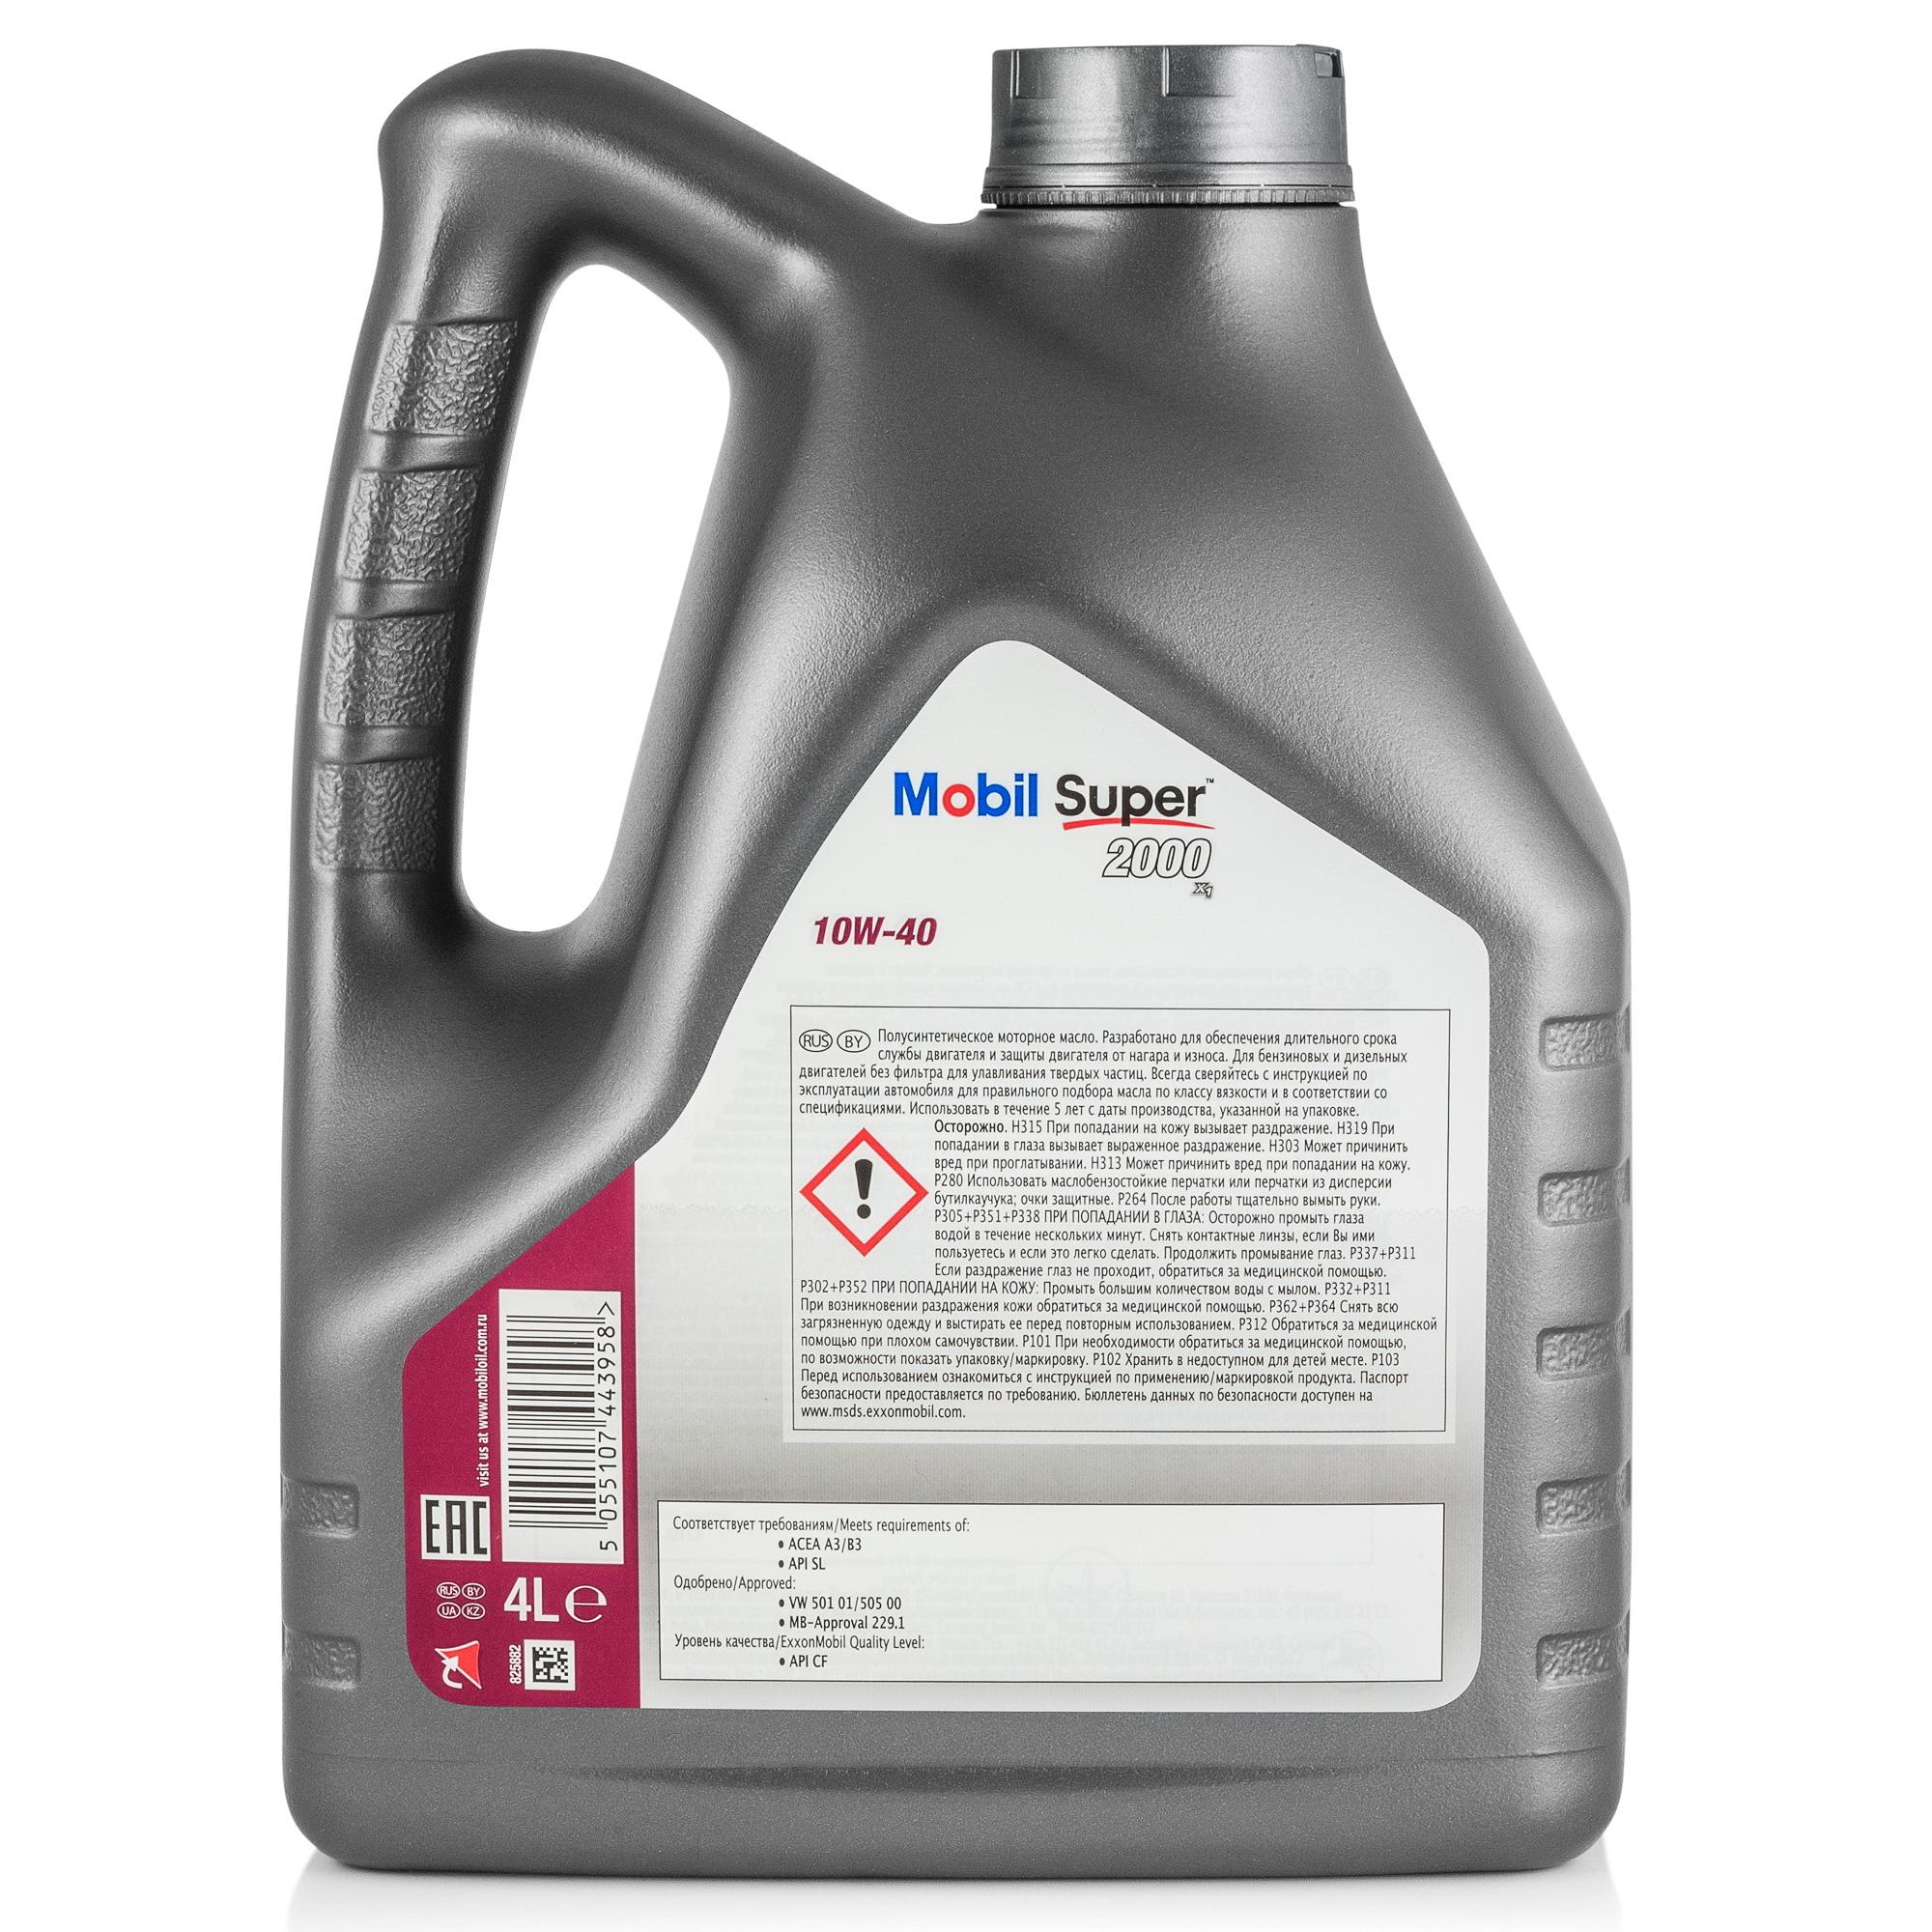 Mobil Super 2000 X1 10W40 Полусинтетическое моторное масло